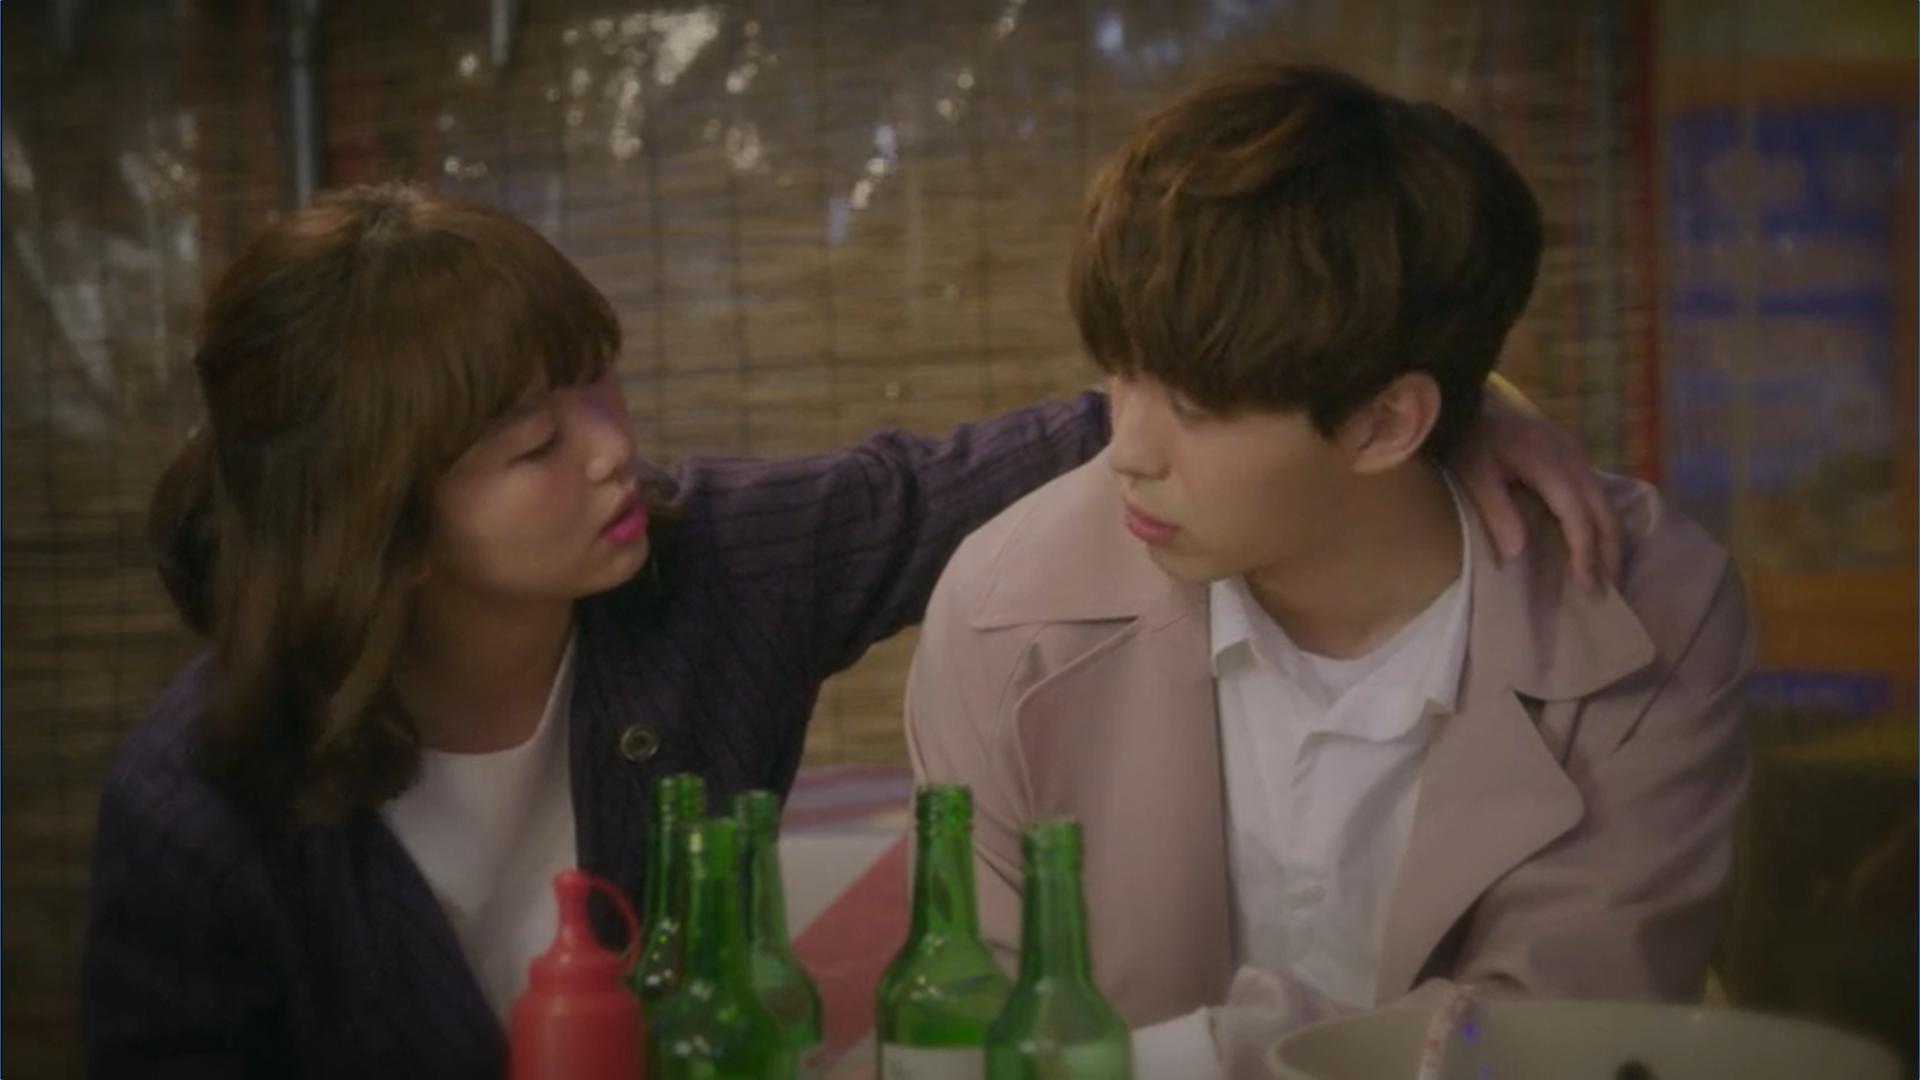 Wednesday 3:30 PM Seon Eun-woo and Yoon Jae-won drinking soju